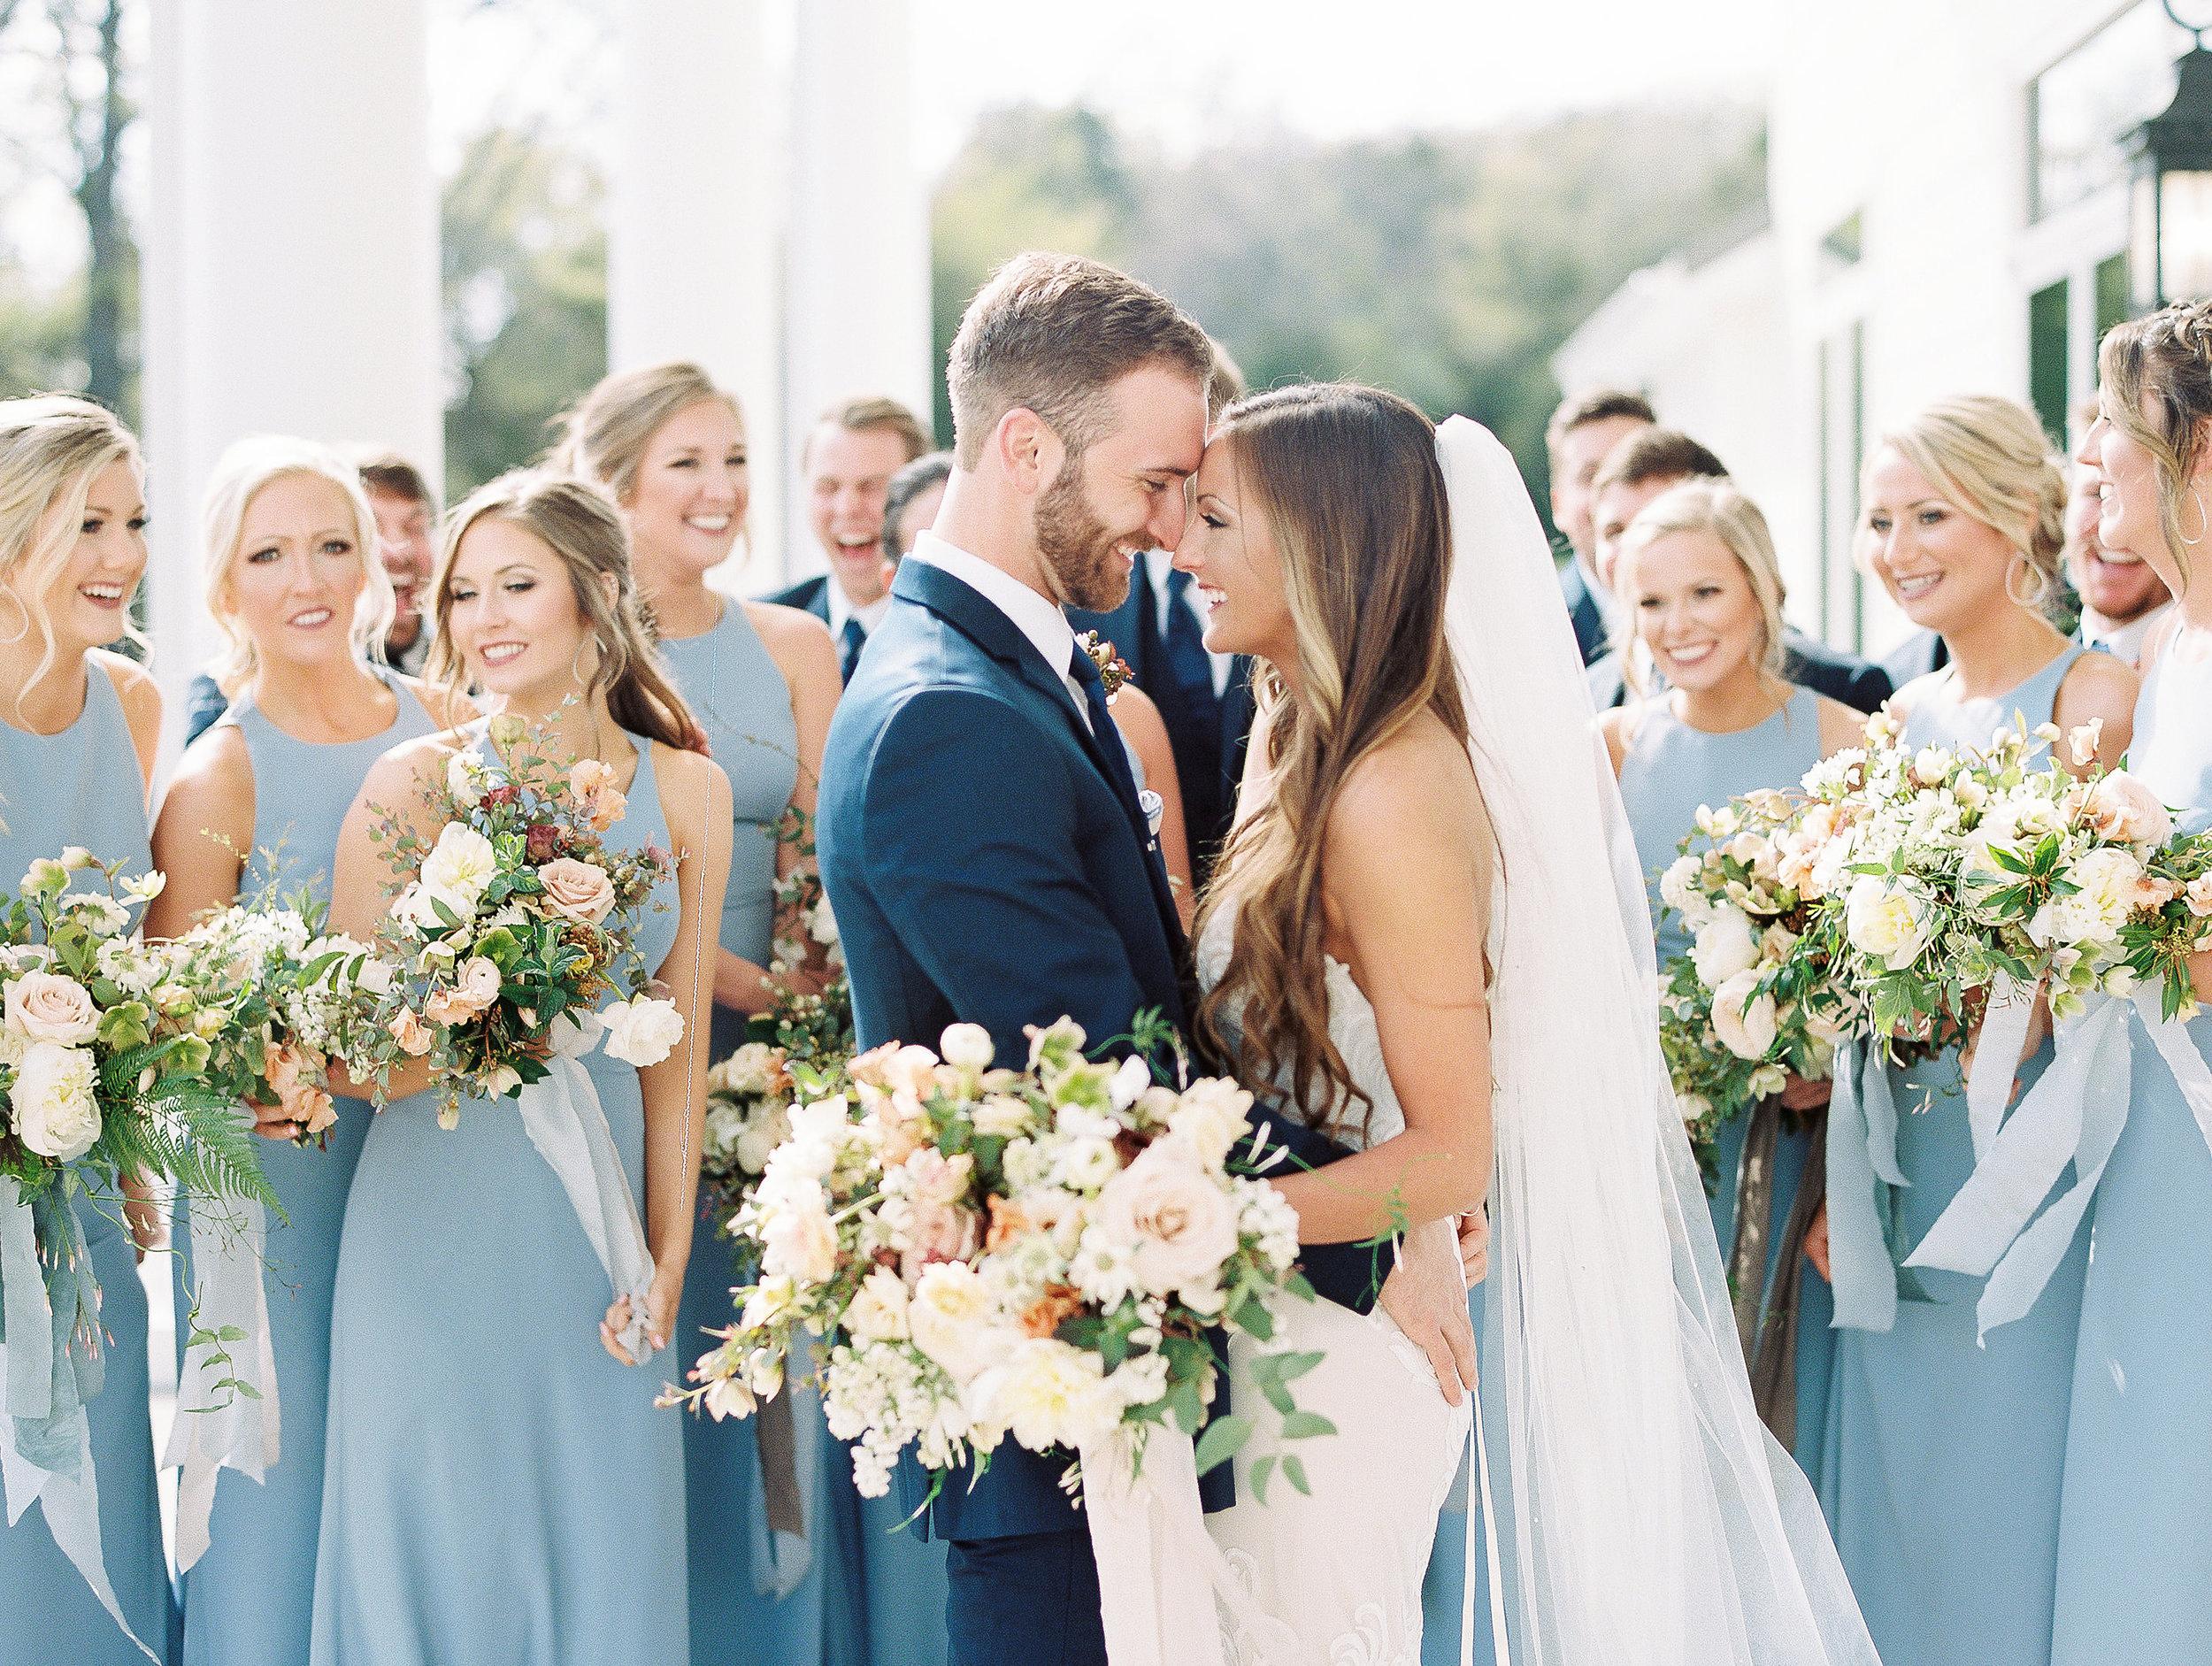 NEXT GALLERY - Southern Spring Wedding